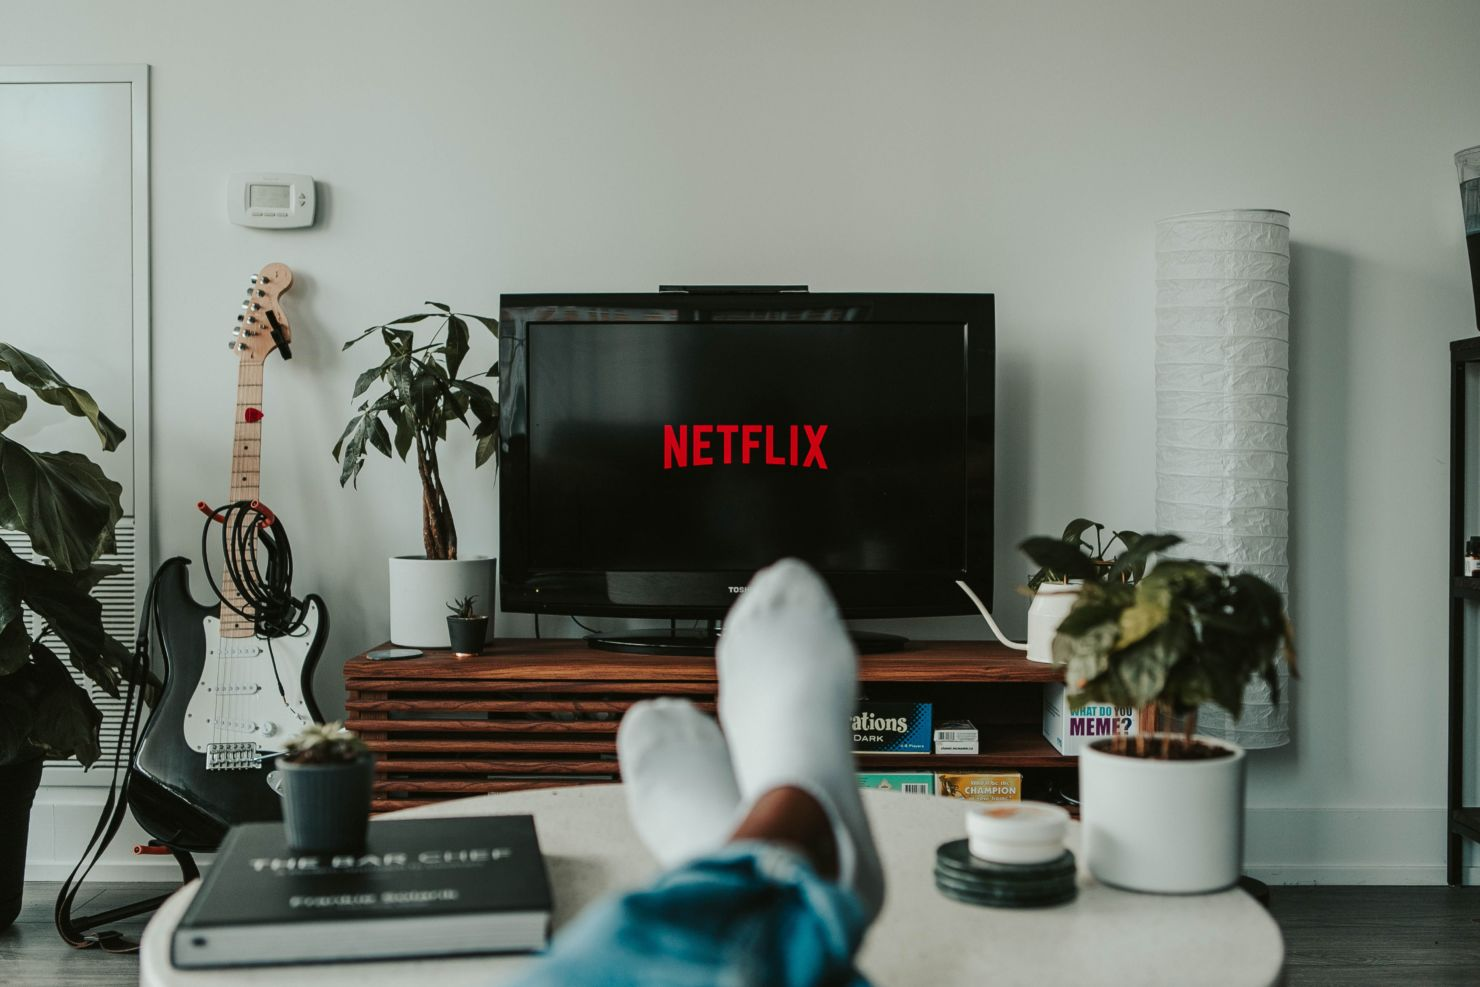 Maya and the Three: La nueva serie animada de Netflix ¡Nos urge verla ya!